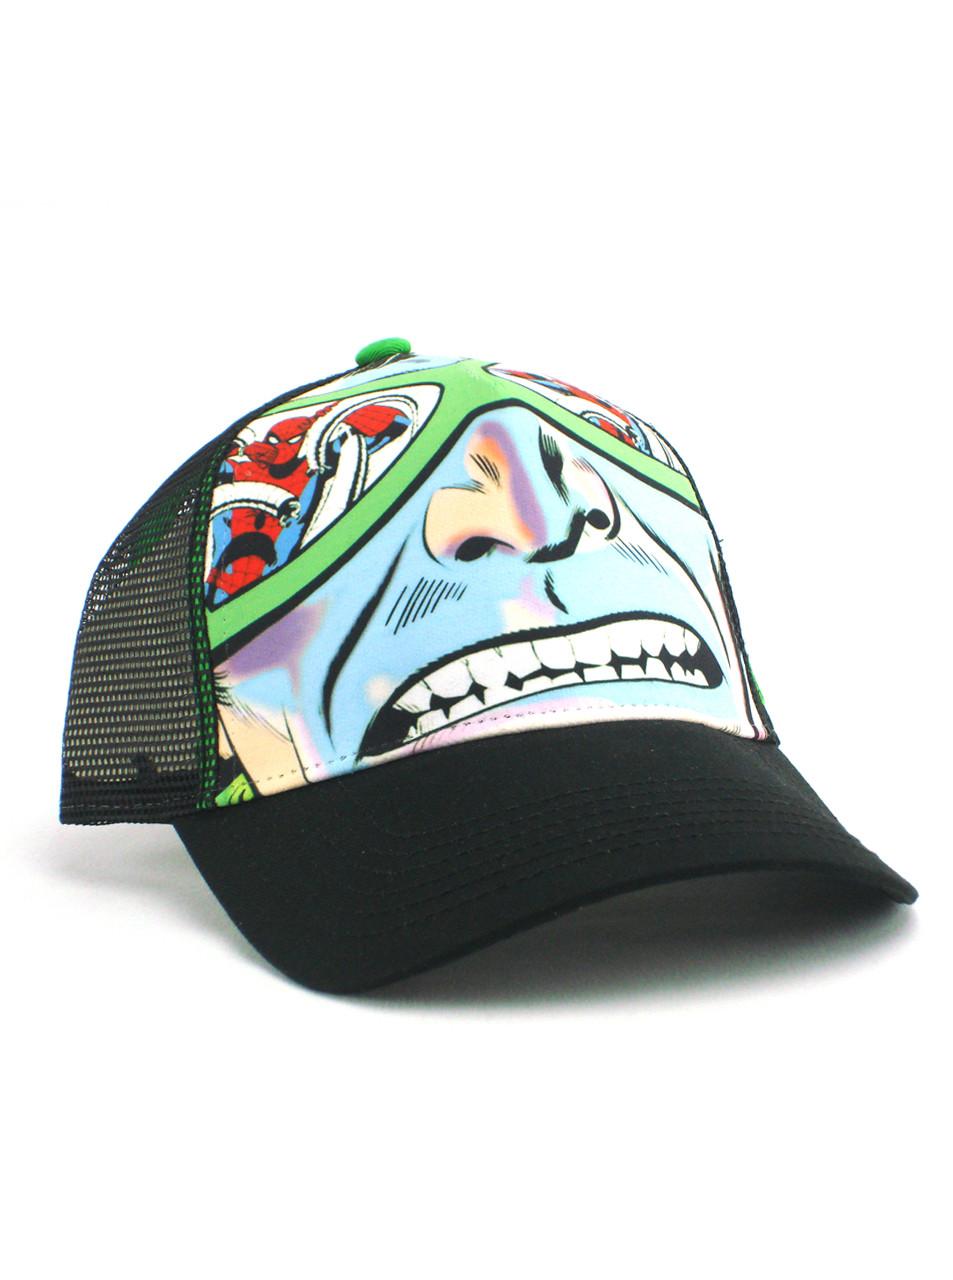 New Era Doctor Octopus Trucker Hat View 1 c995969a5a2